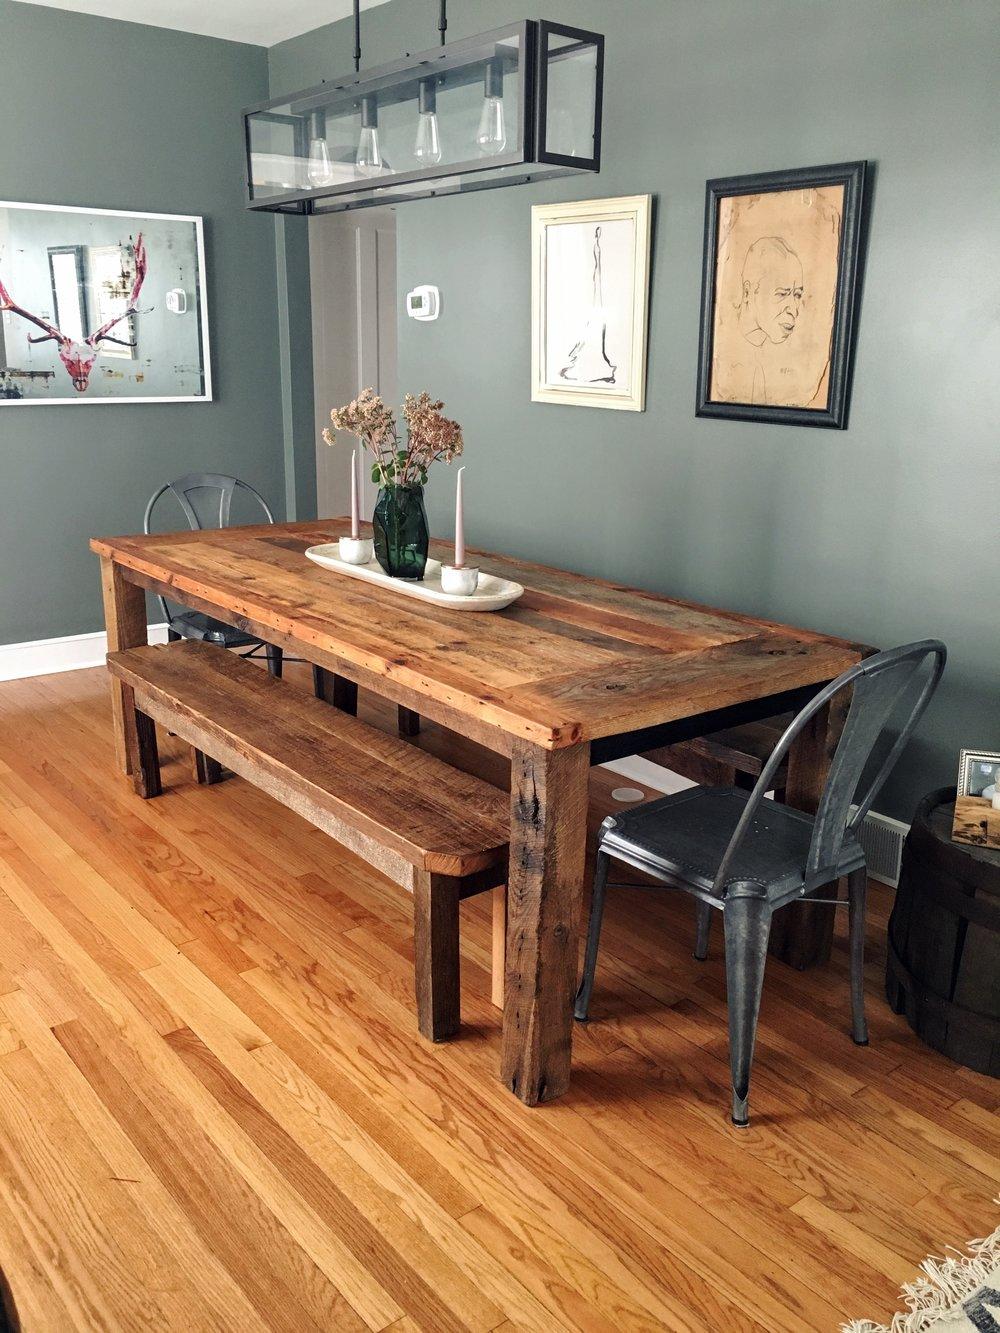 Reclaimed Wood Farmhouse Dining Table / Textured Finish